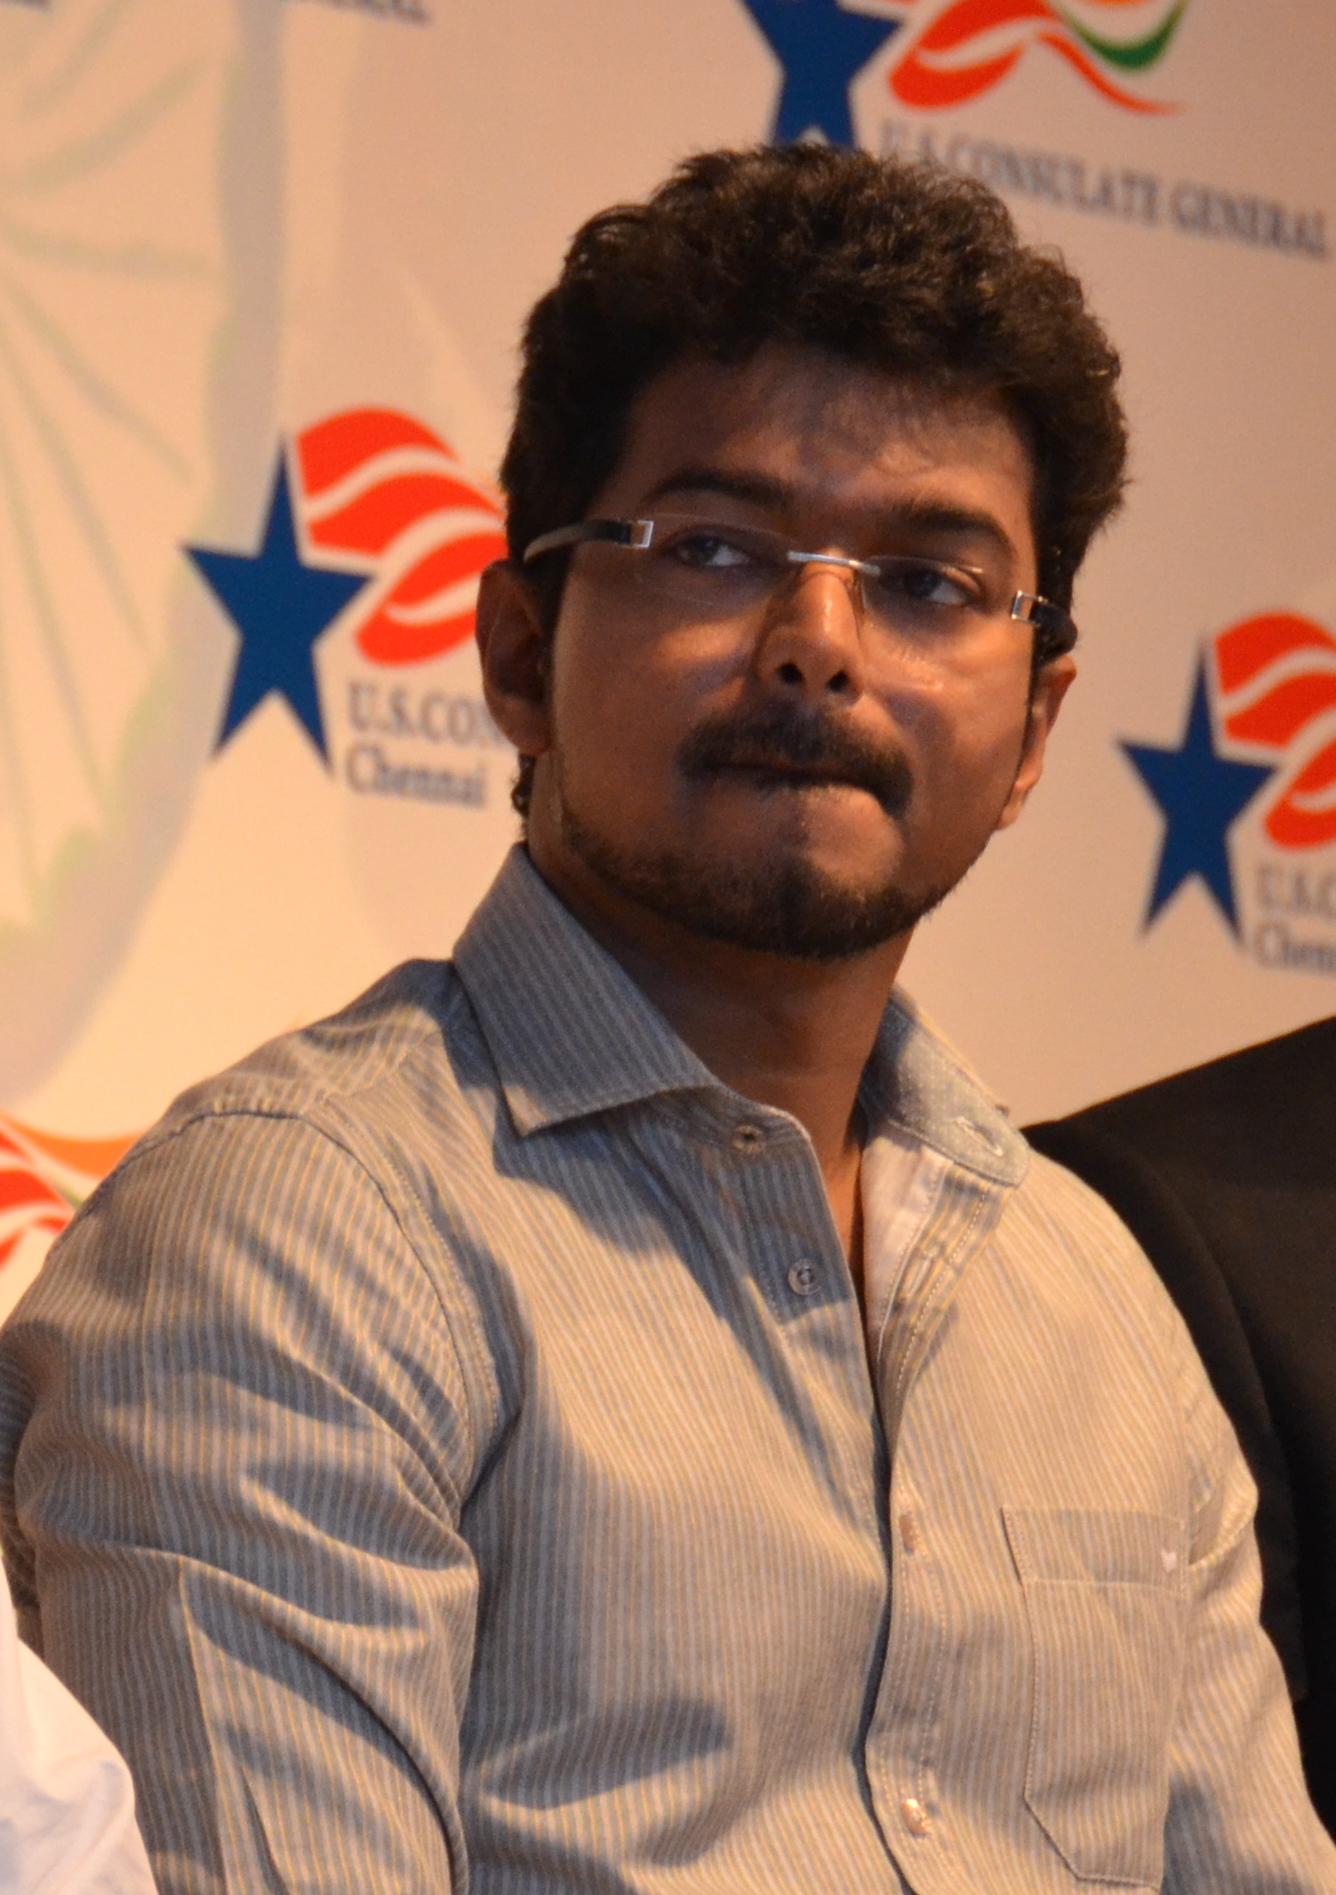 Dateitamil Film Actor Vijay Celebrating World Environment Day At